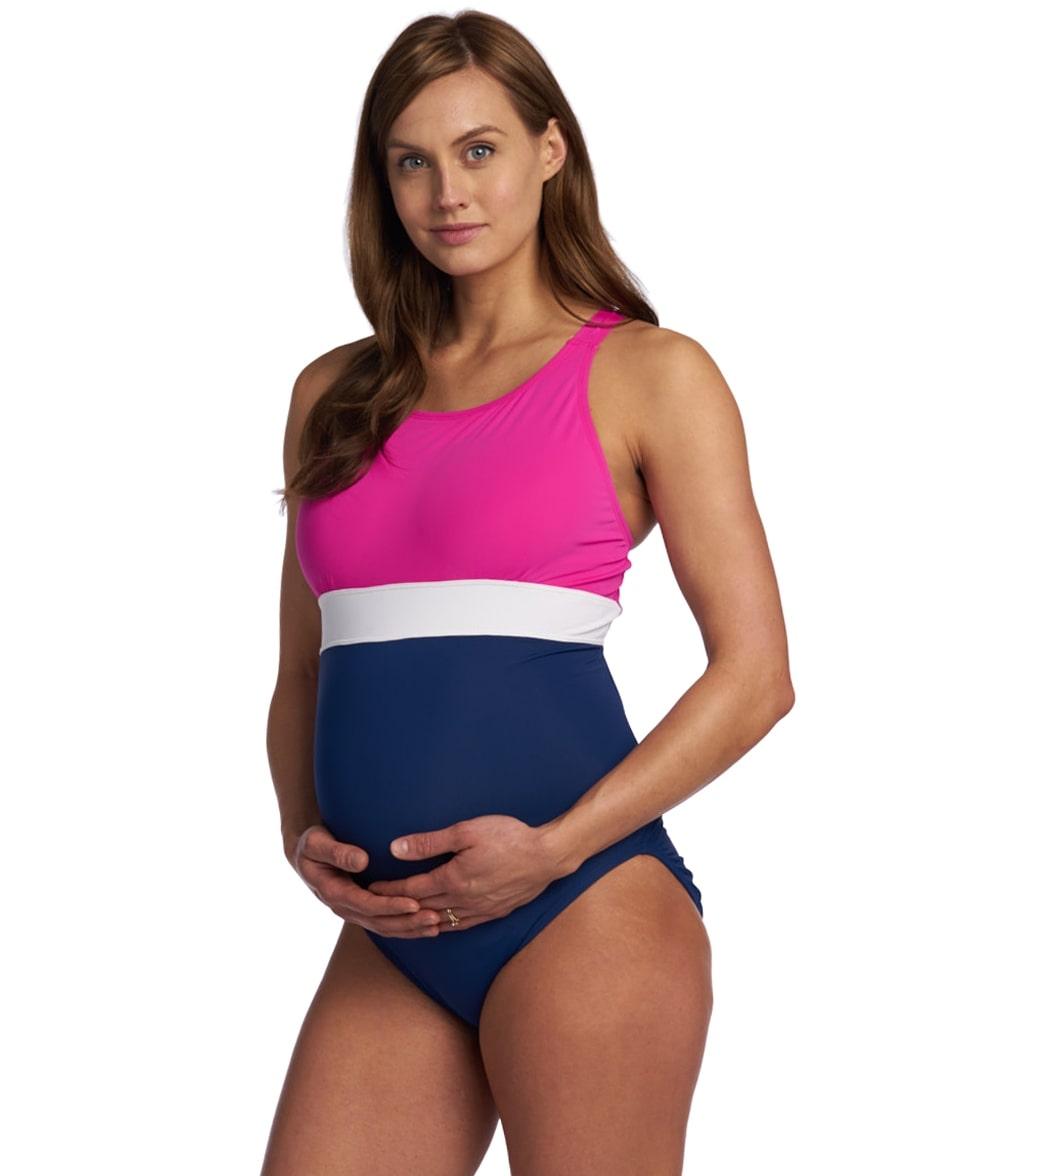 ed603b4cd9c78 EQ Swimwear Banded Harmony Maternity One Piece Swimsuit at ...